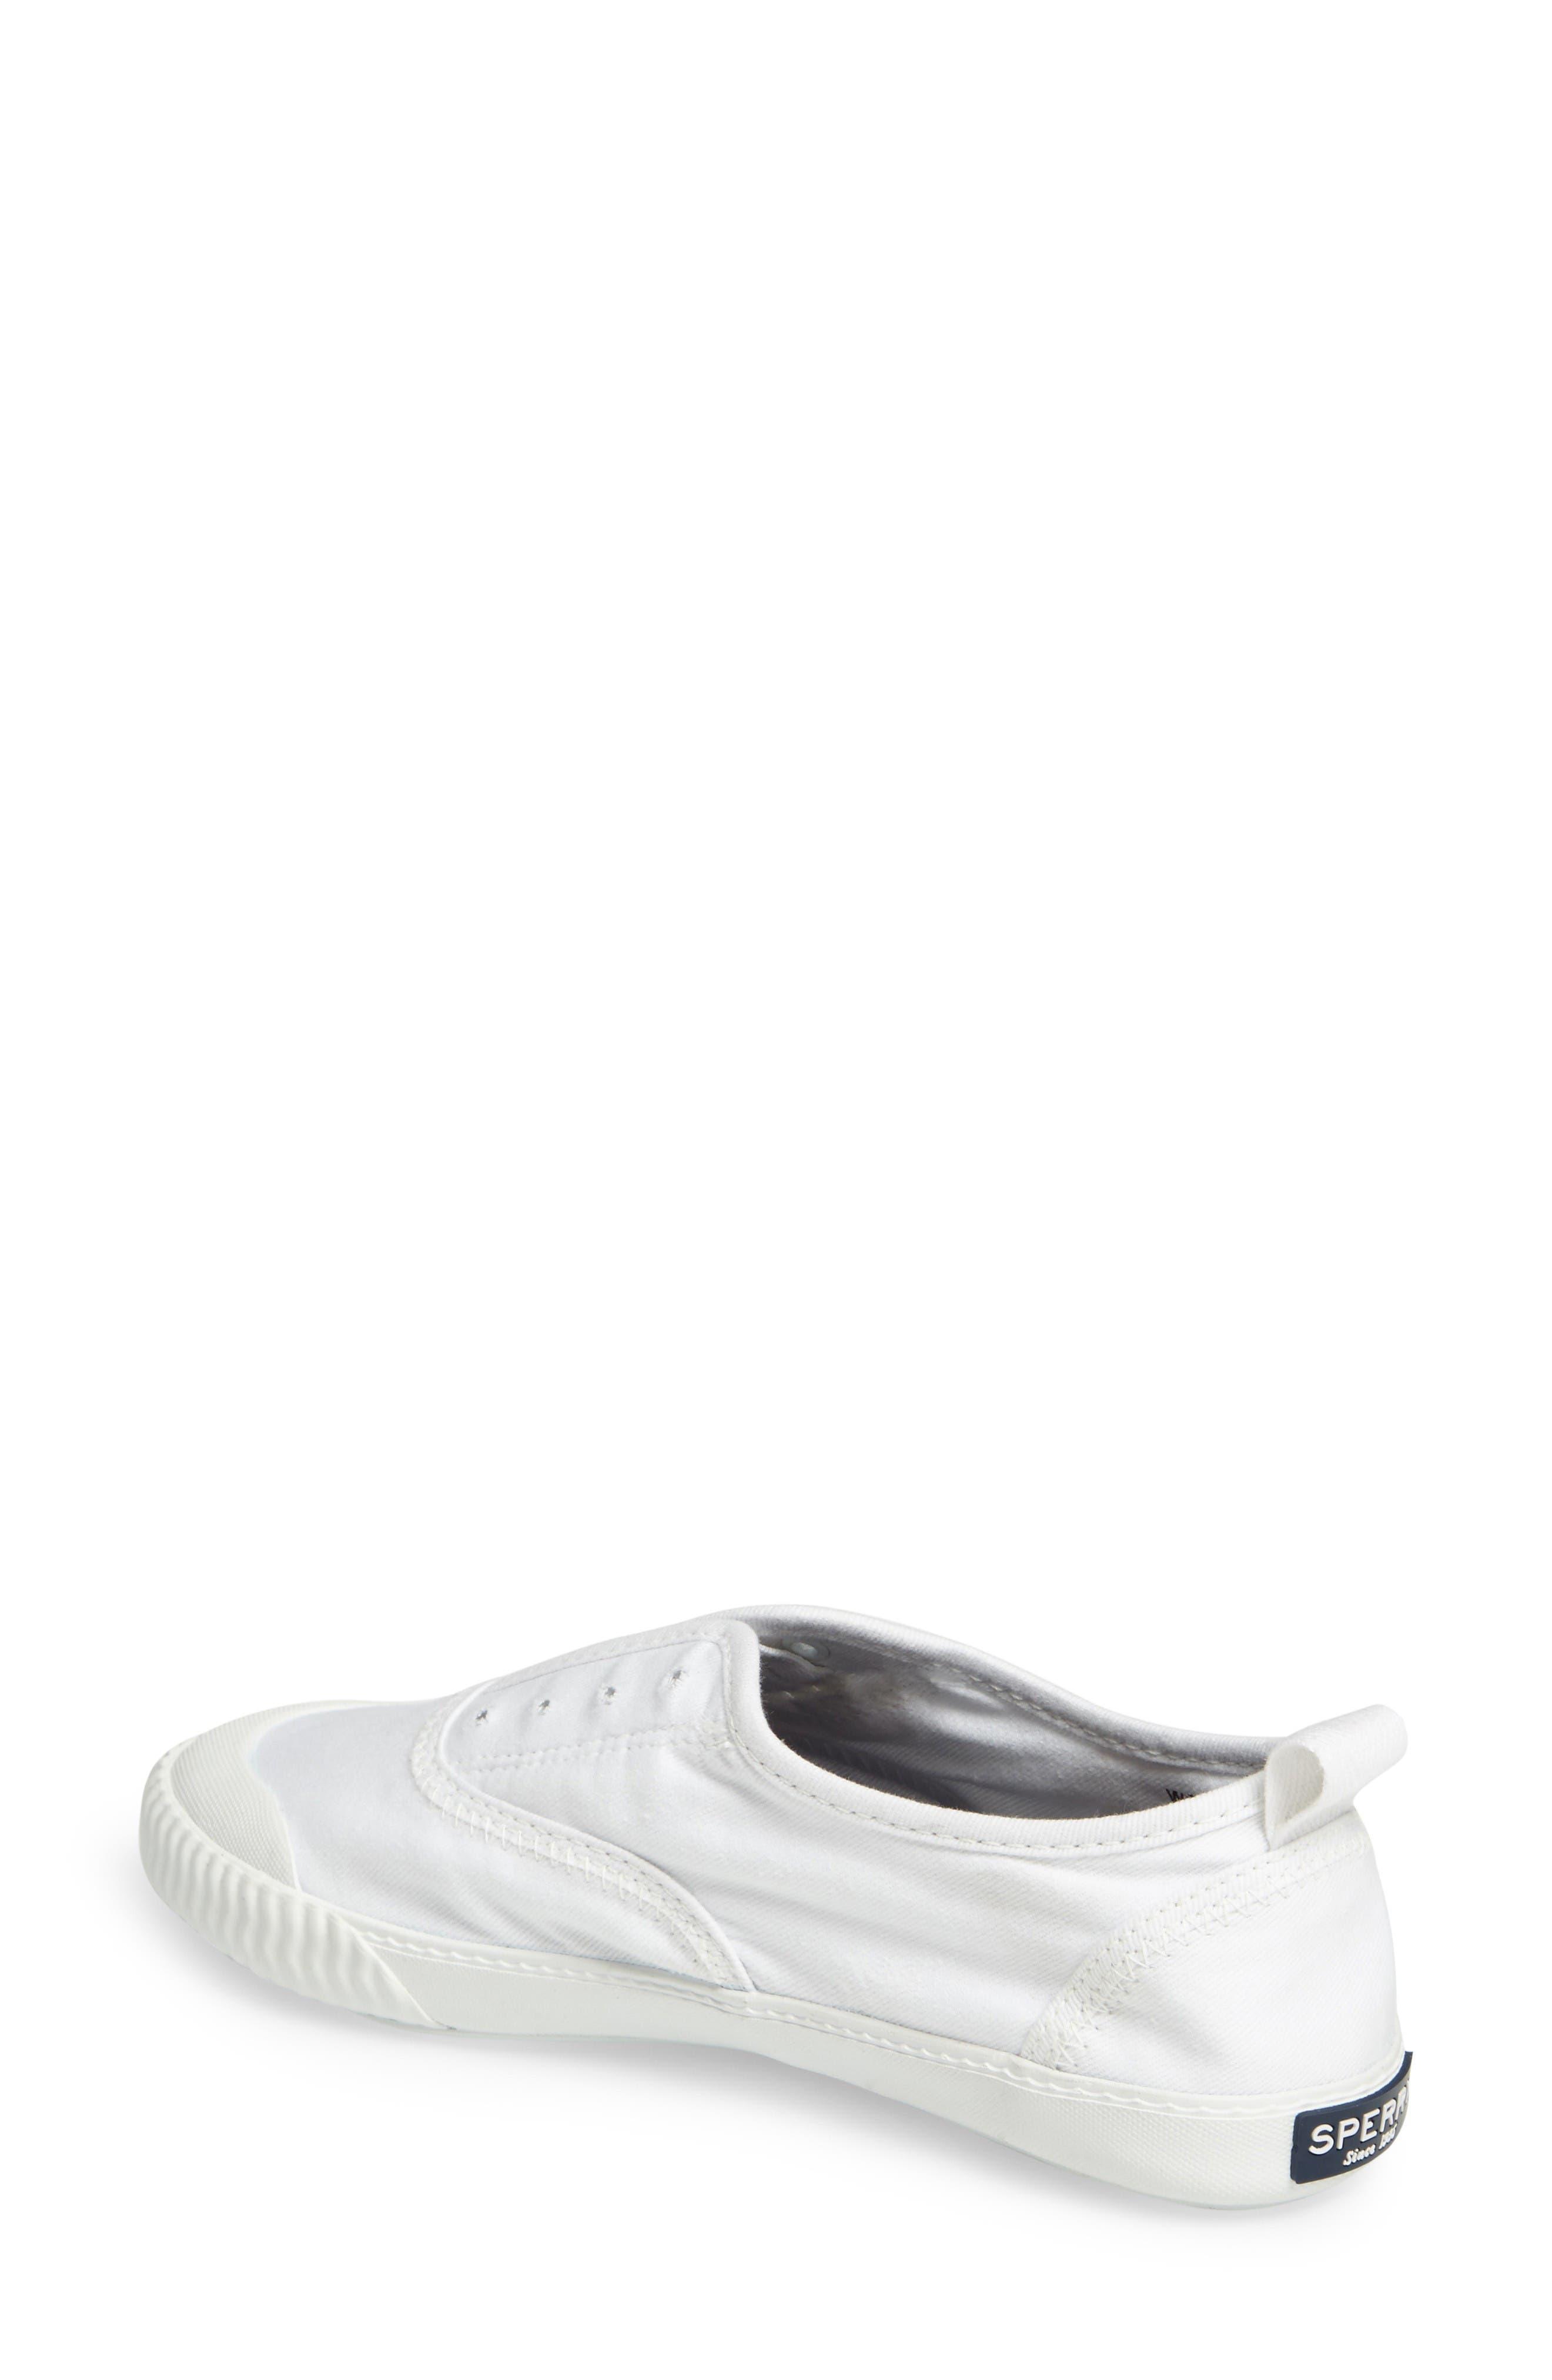 Sayel Slip-On Sneaker,                             Alternate thumbnail 2, color,                             White Fabric